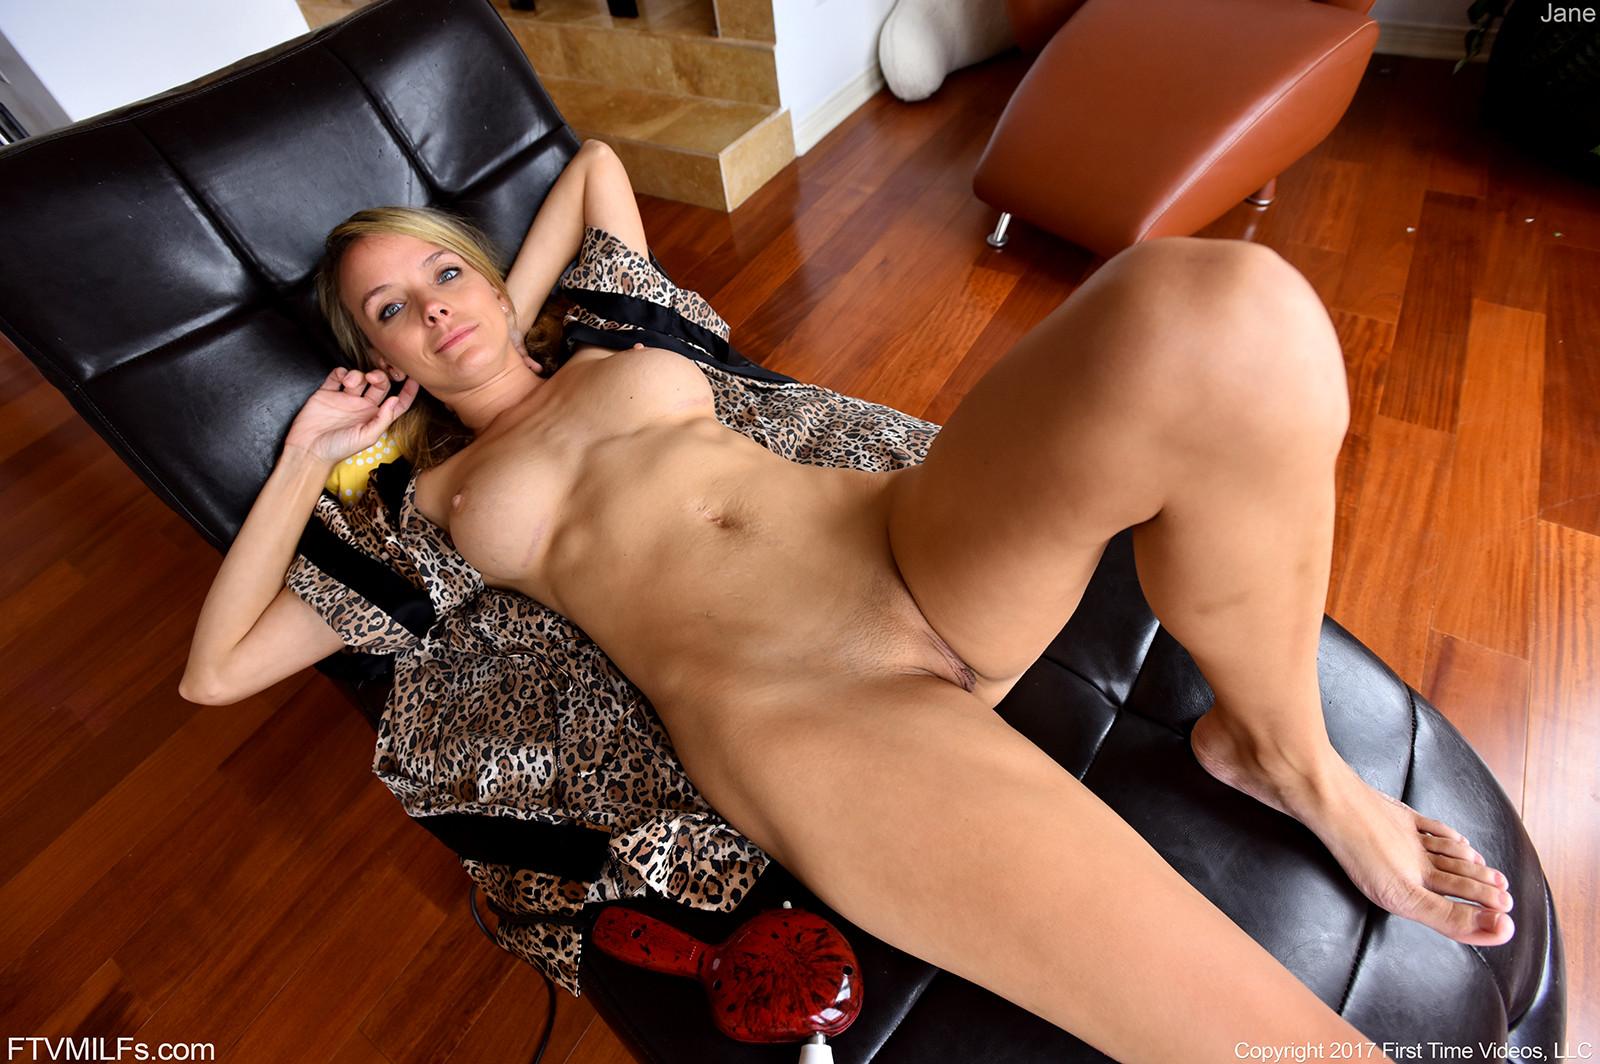 Hot Babe Milf Pics